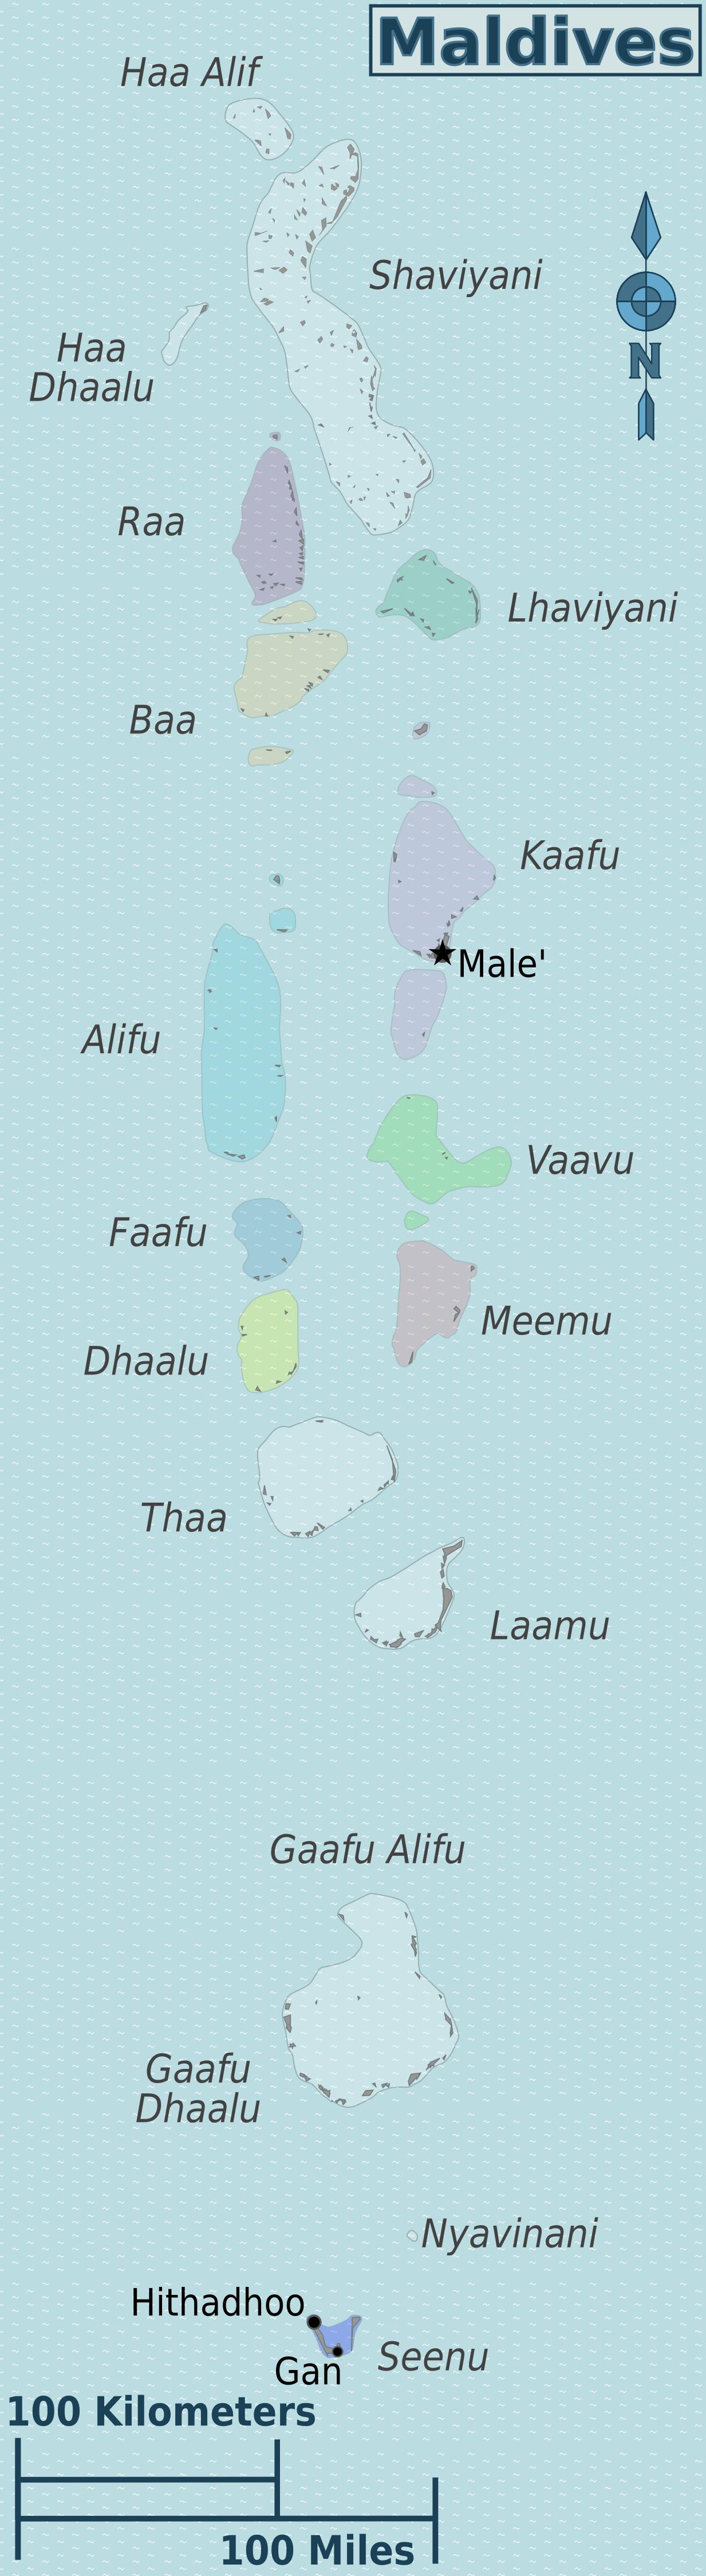 Мальдивы атоллы на карте